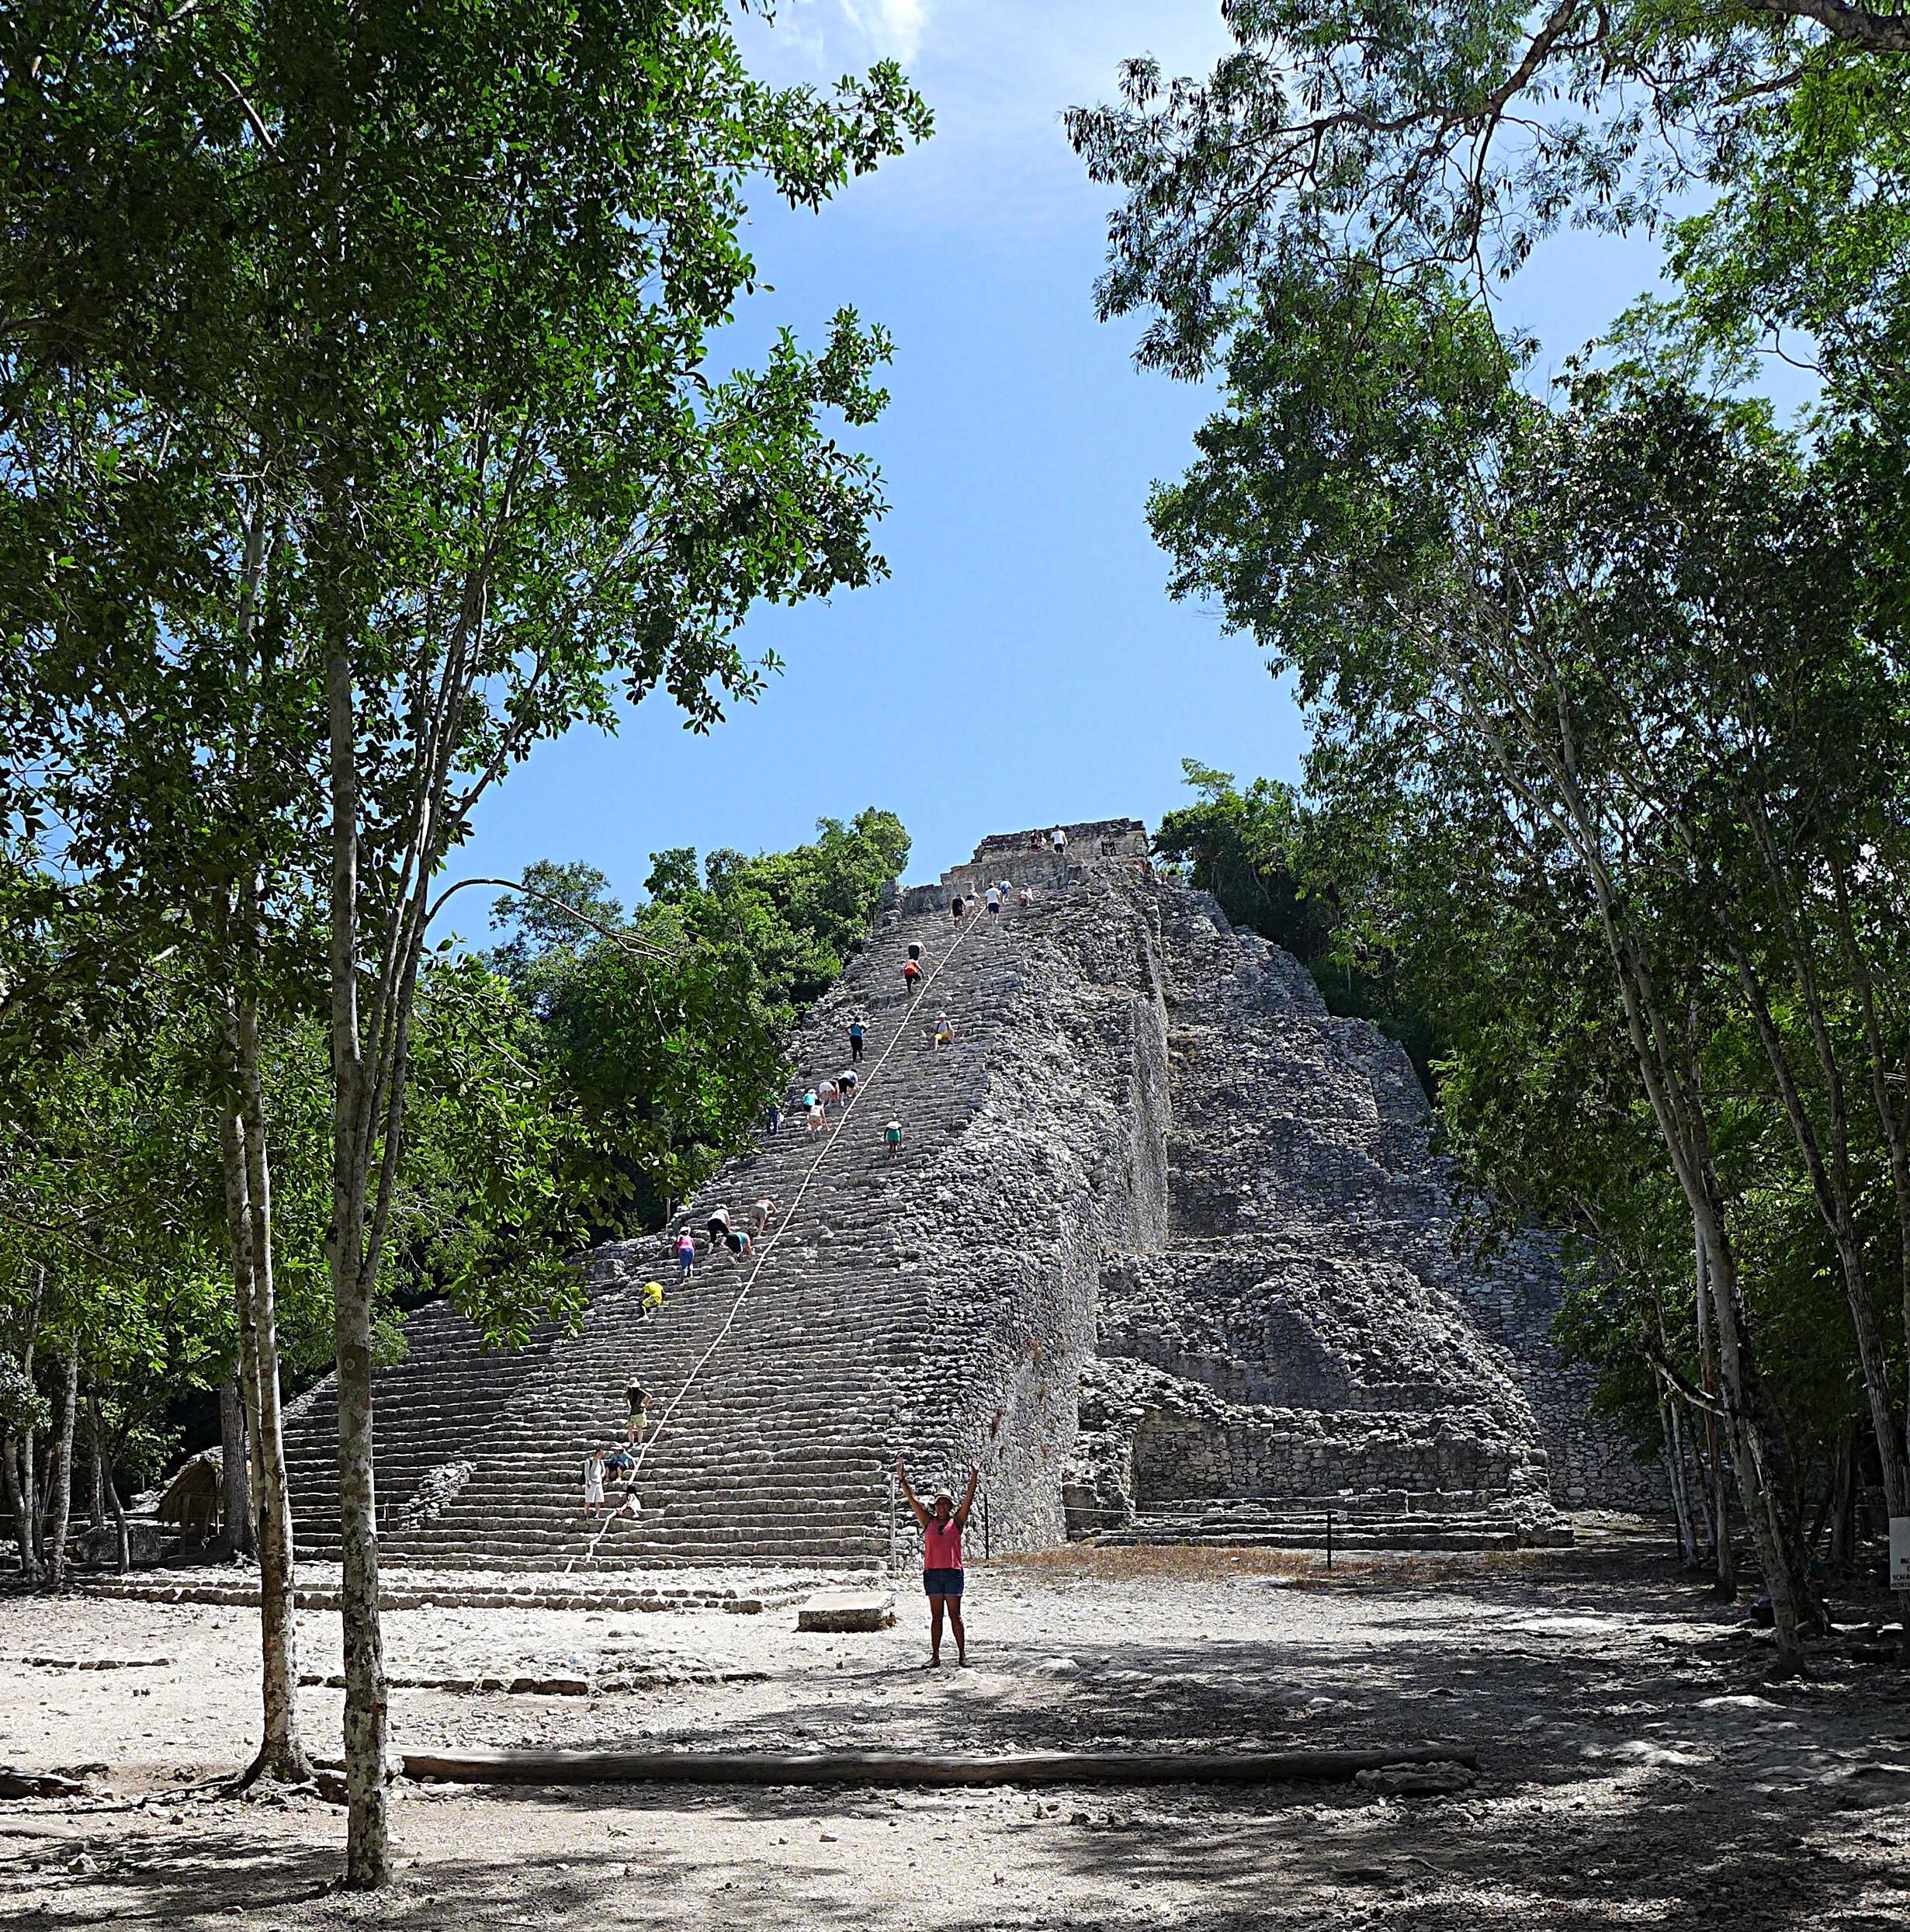 Pyramid Ixmoja